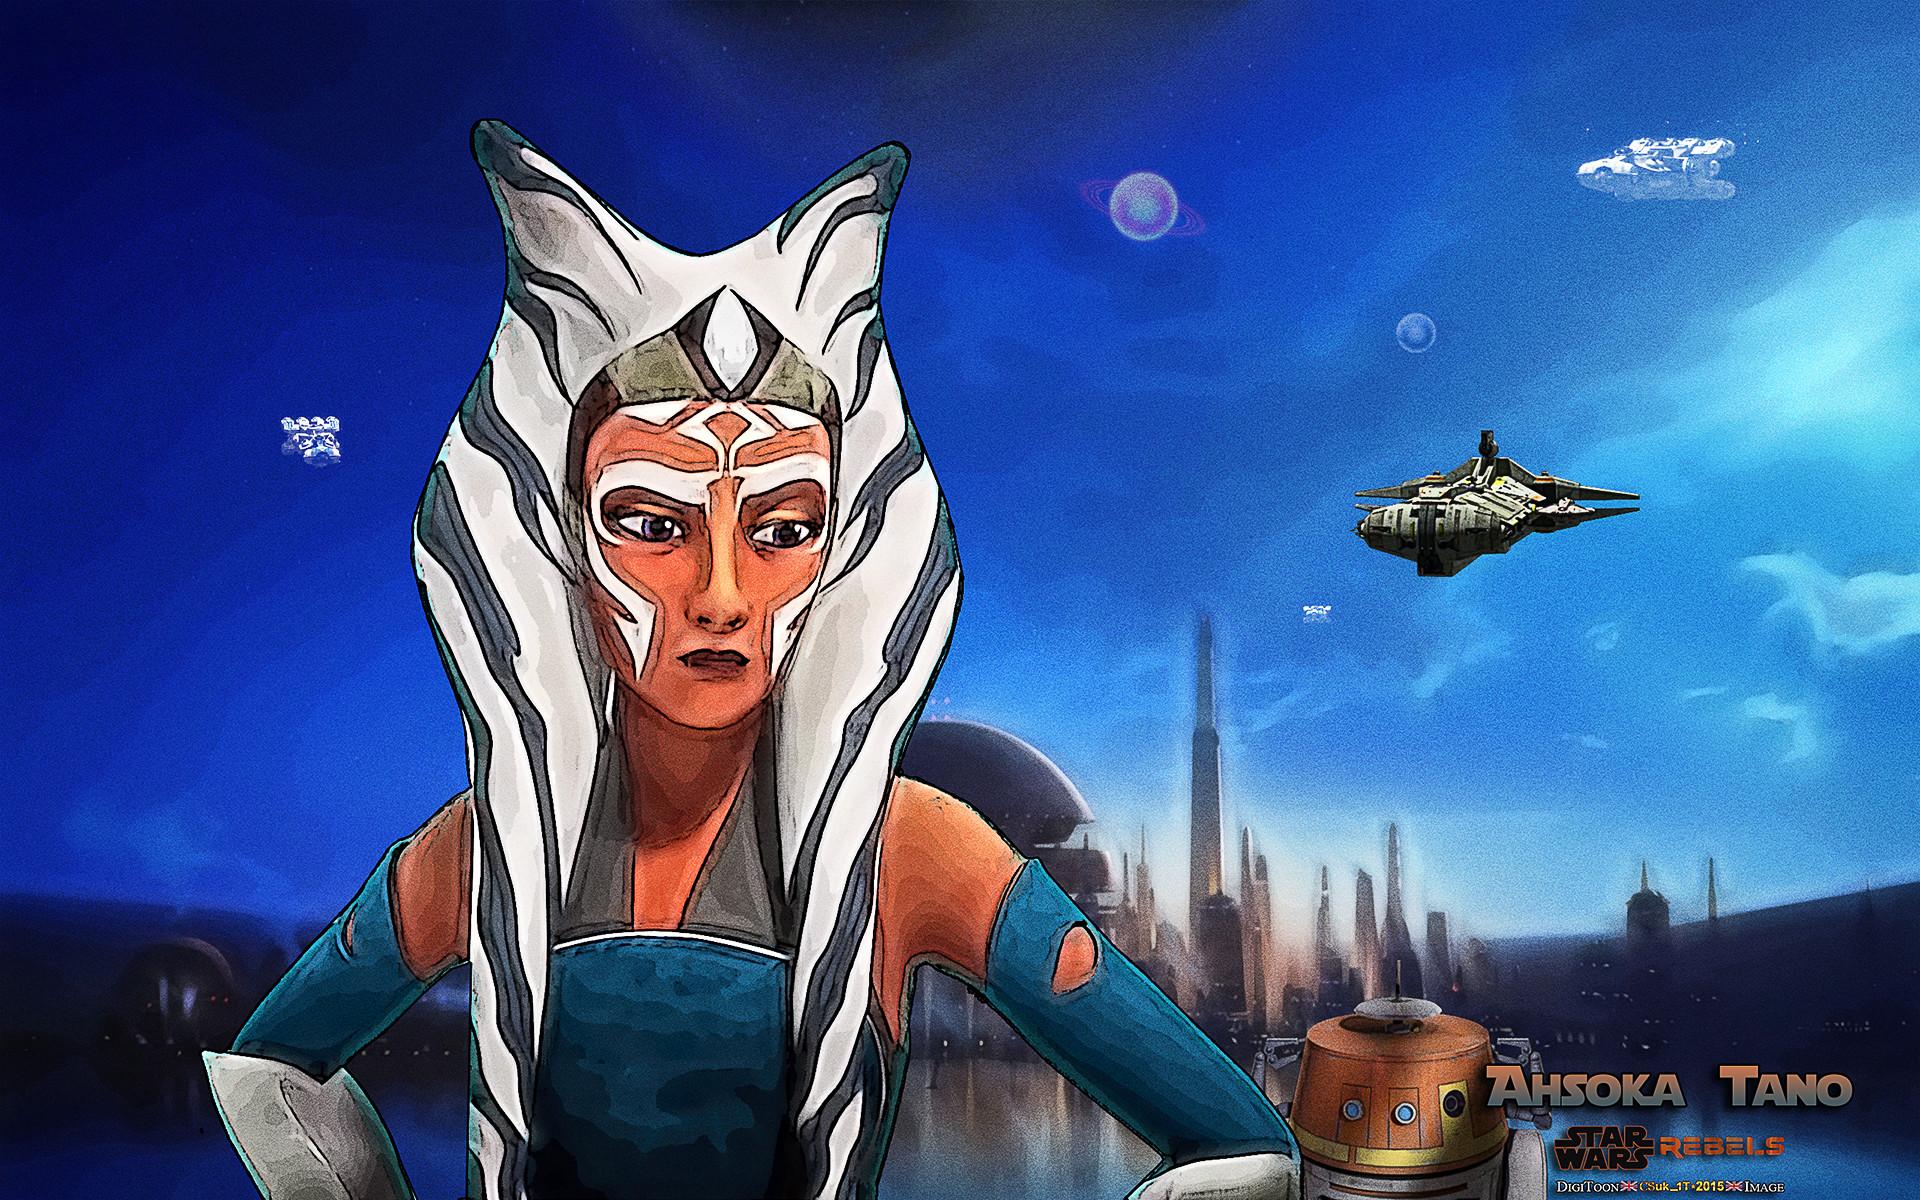 Star Wars Rebels Wallpapers (86+ Images